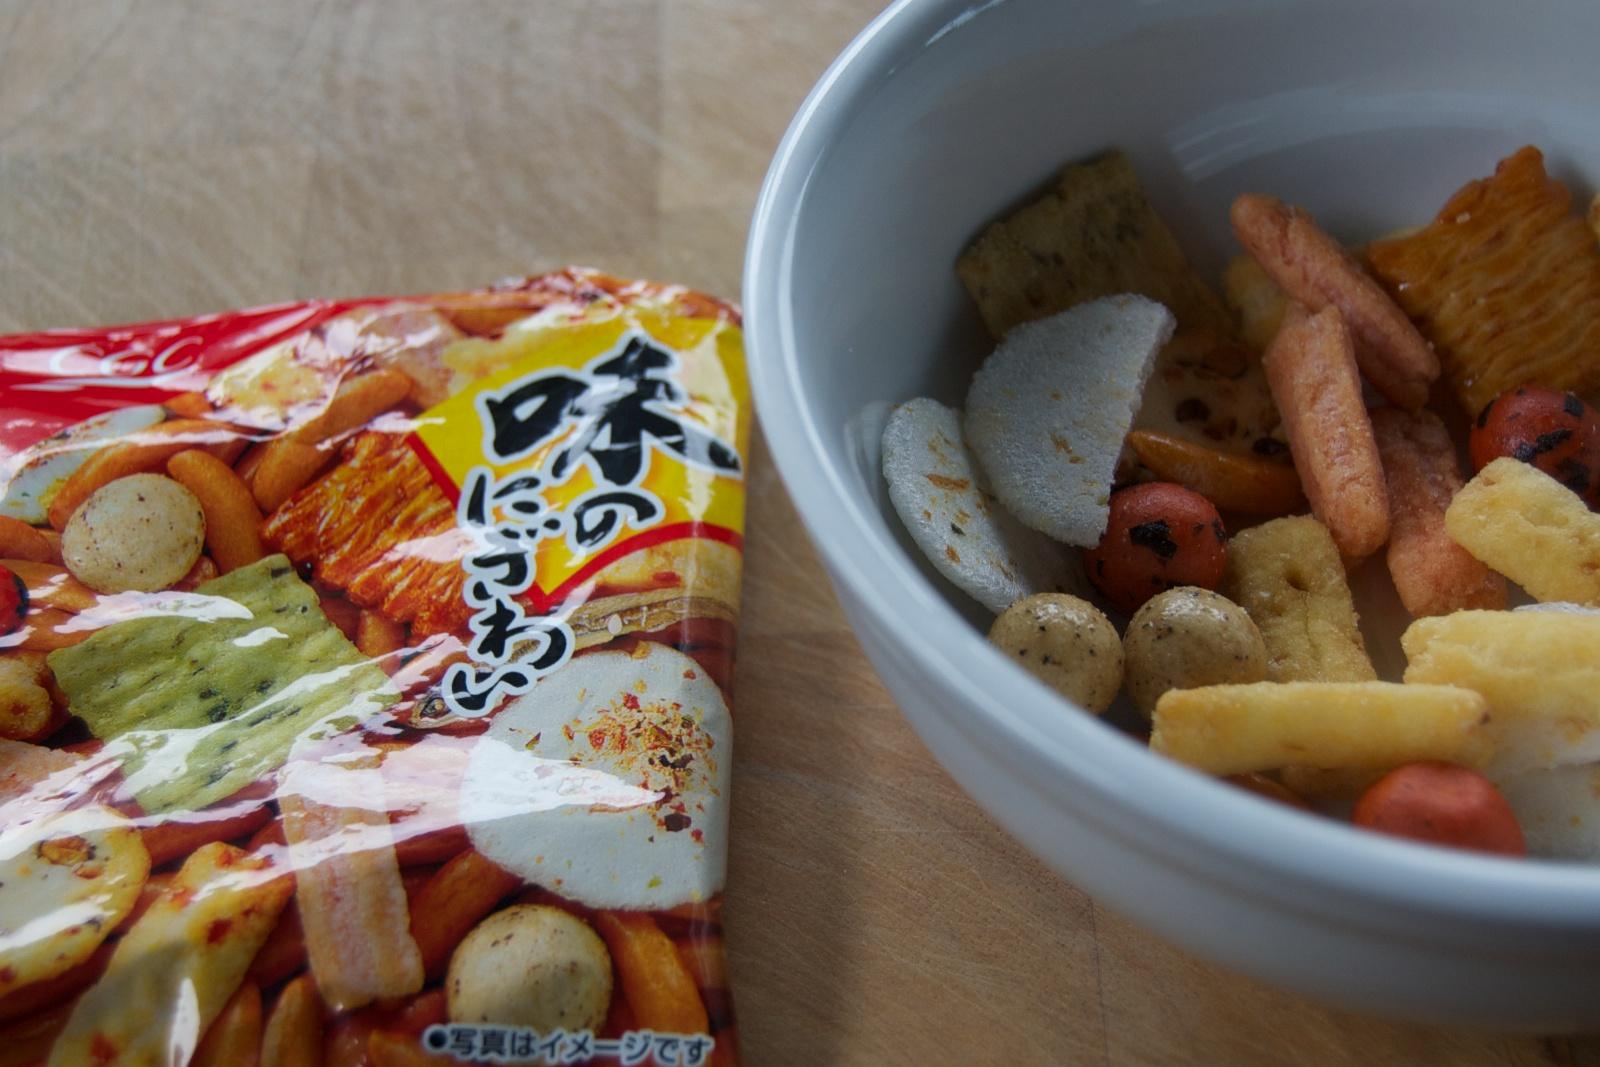 http://blog.rickk.com/food/2014/07/28/ate.2014.07.28.s1.jpg